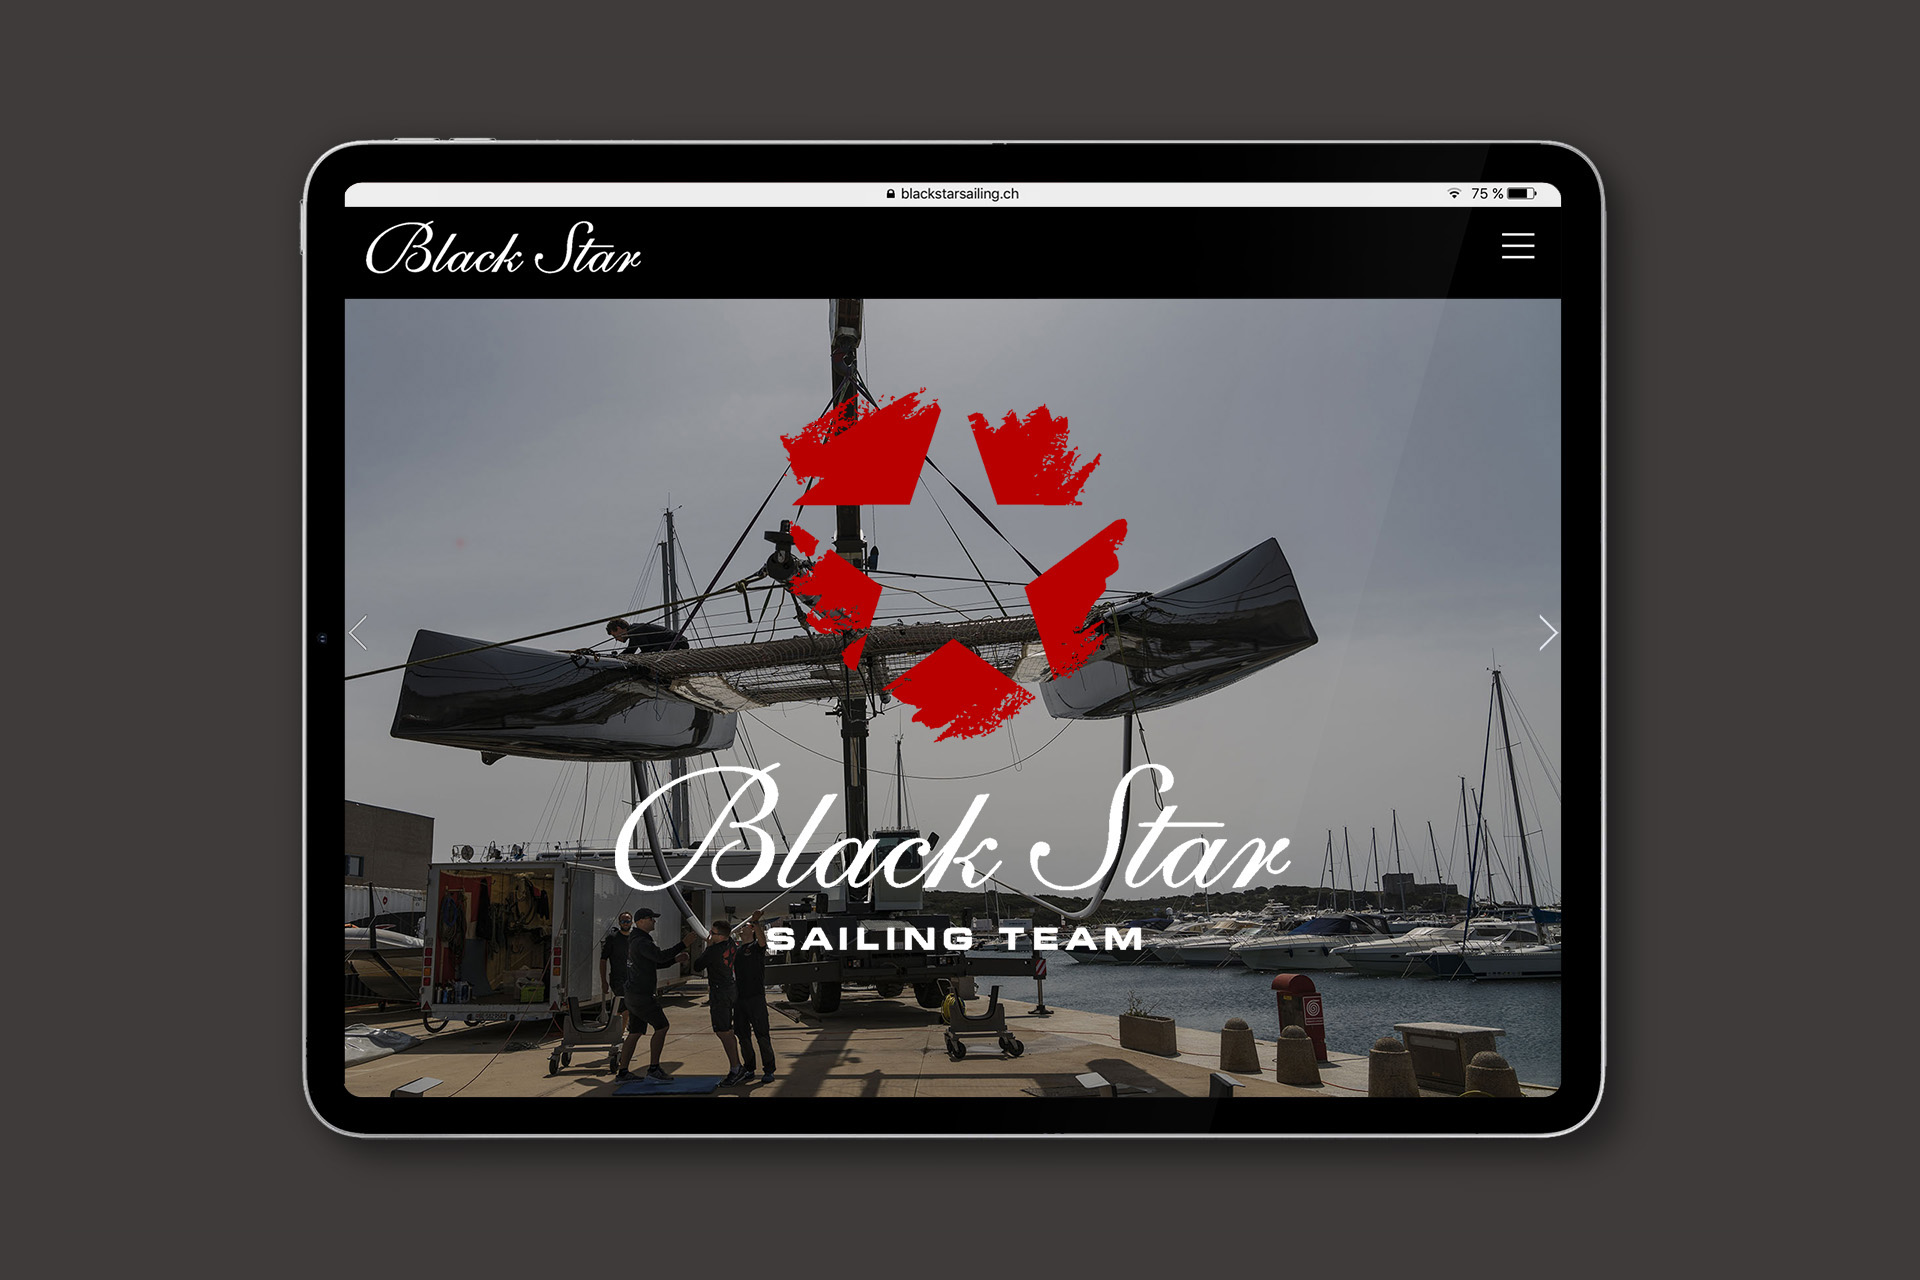 BlackStarSailing_iPad_03